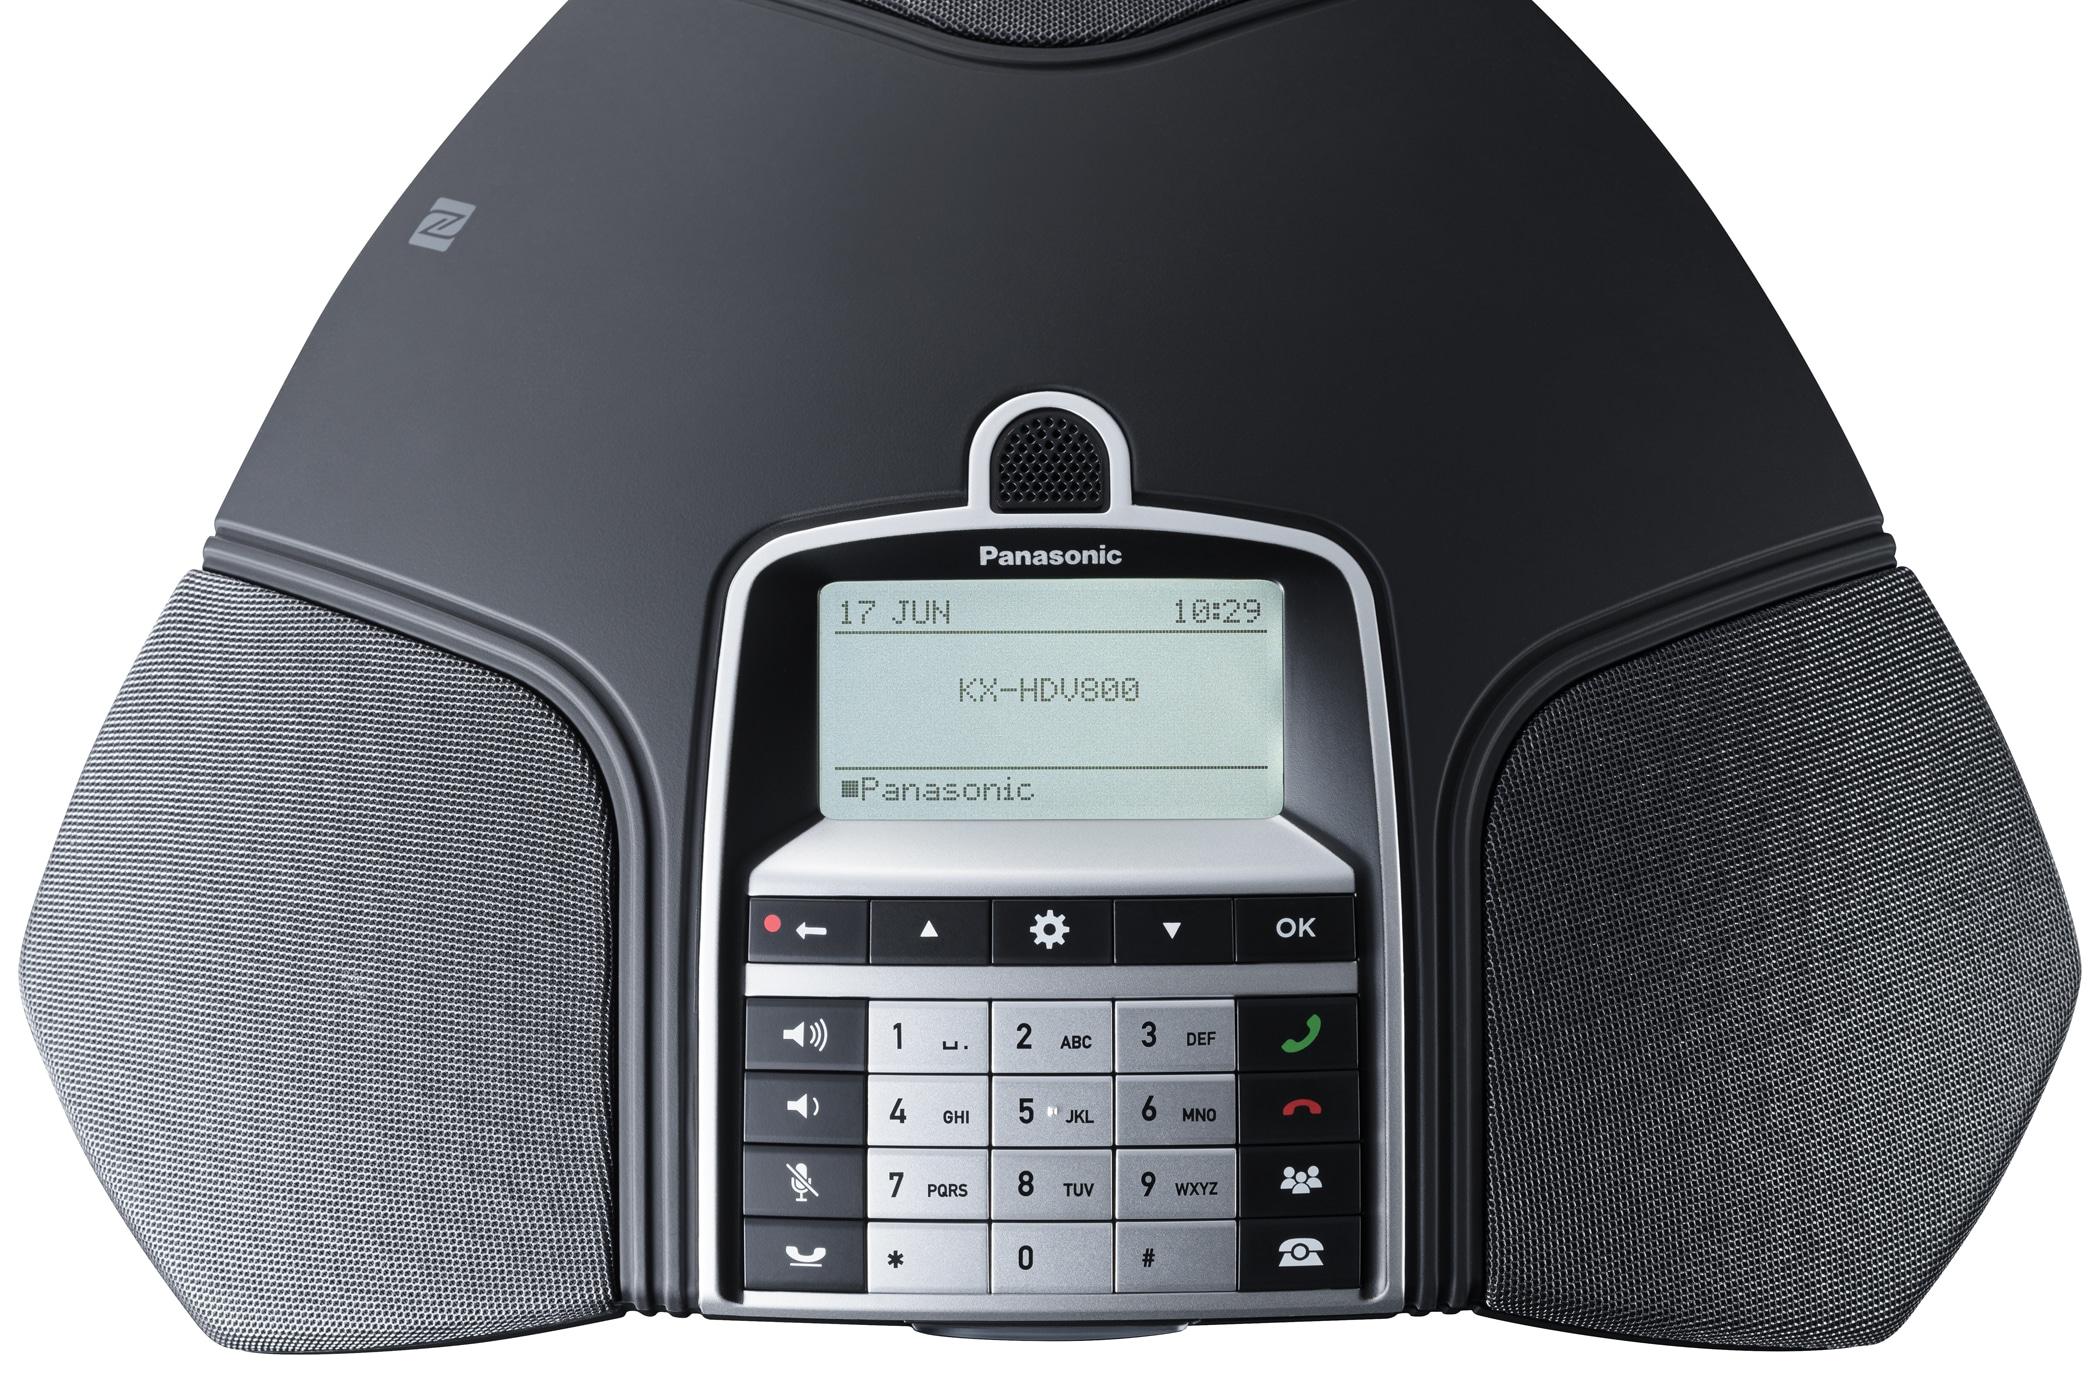 Panasonic kx_hd800_p2